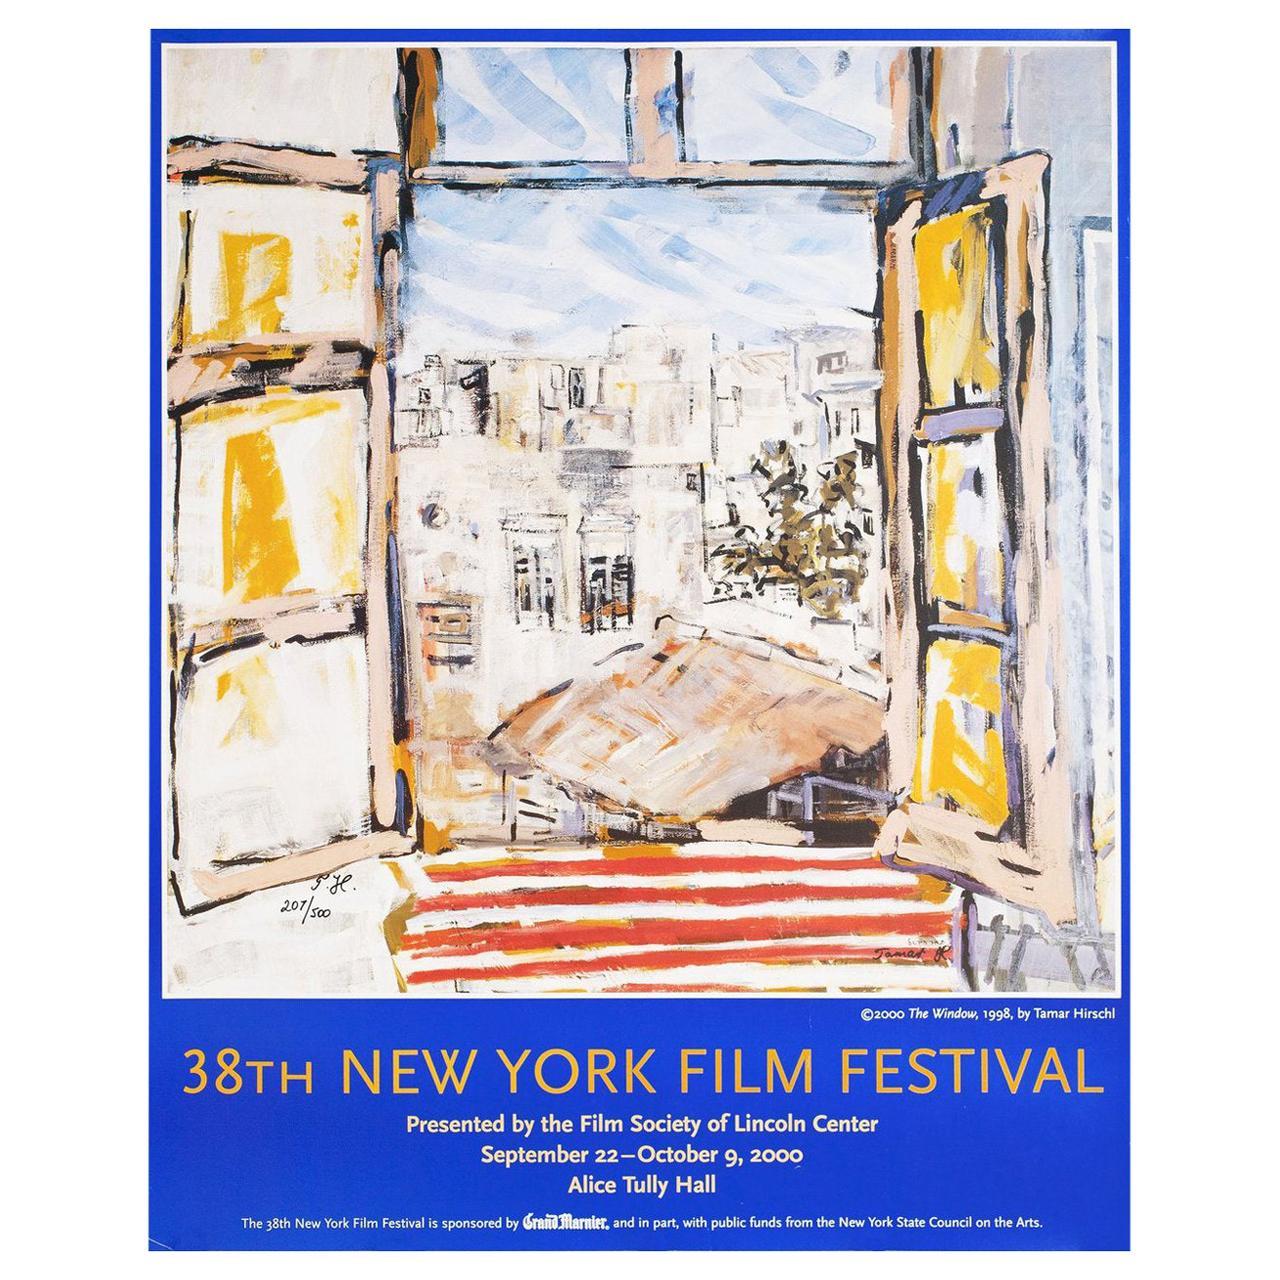 38th New York Film Festival 2000 U.S. Poster Signed